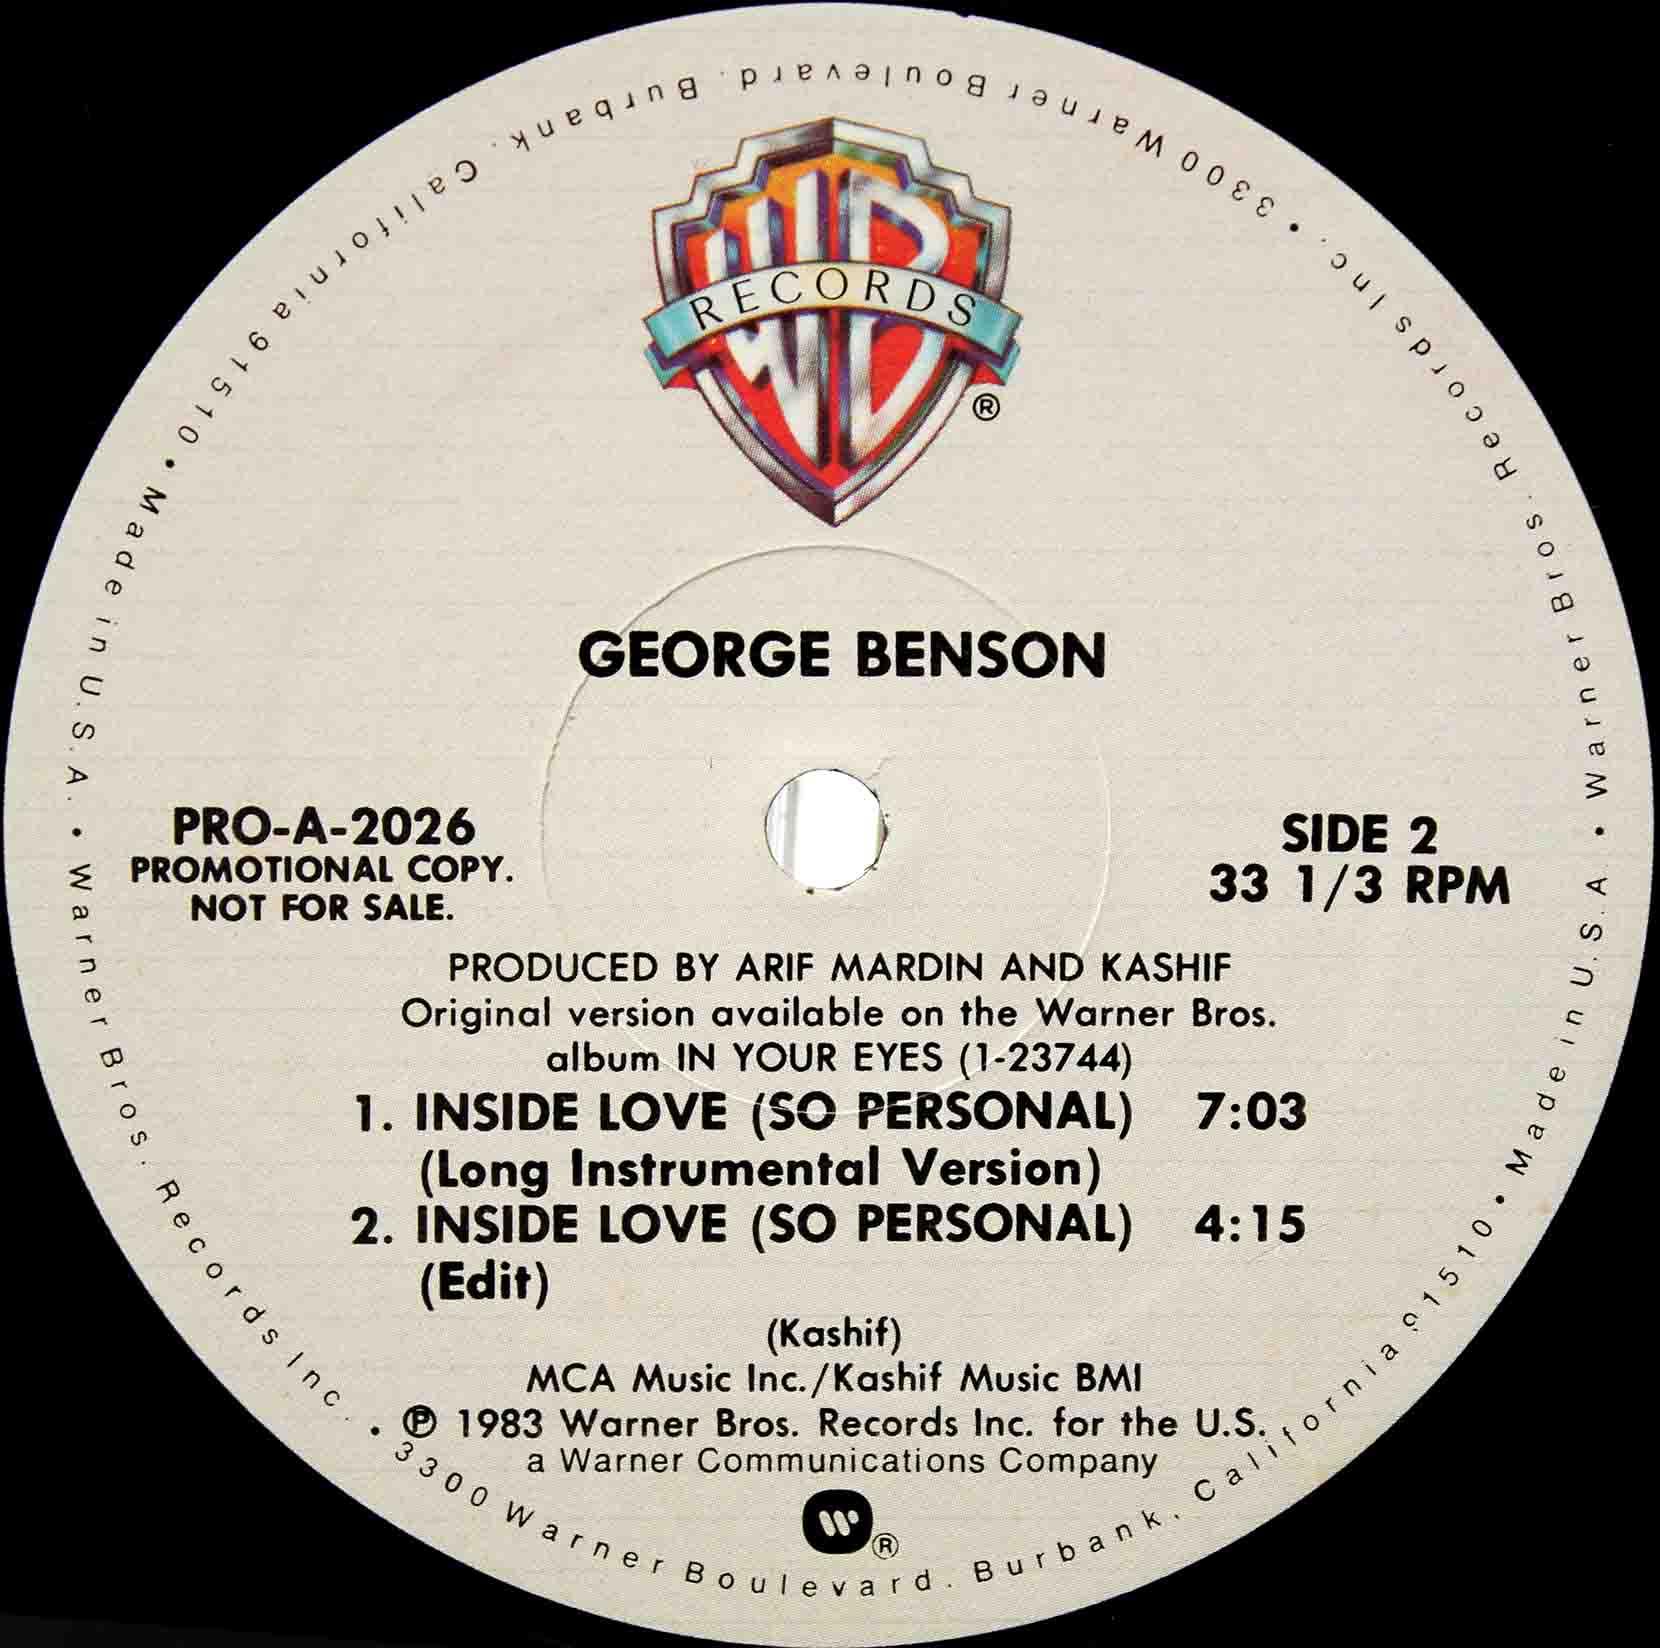 George Benson – Inside Love 03